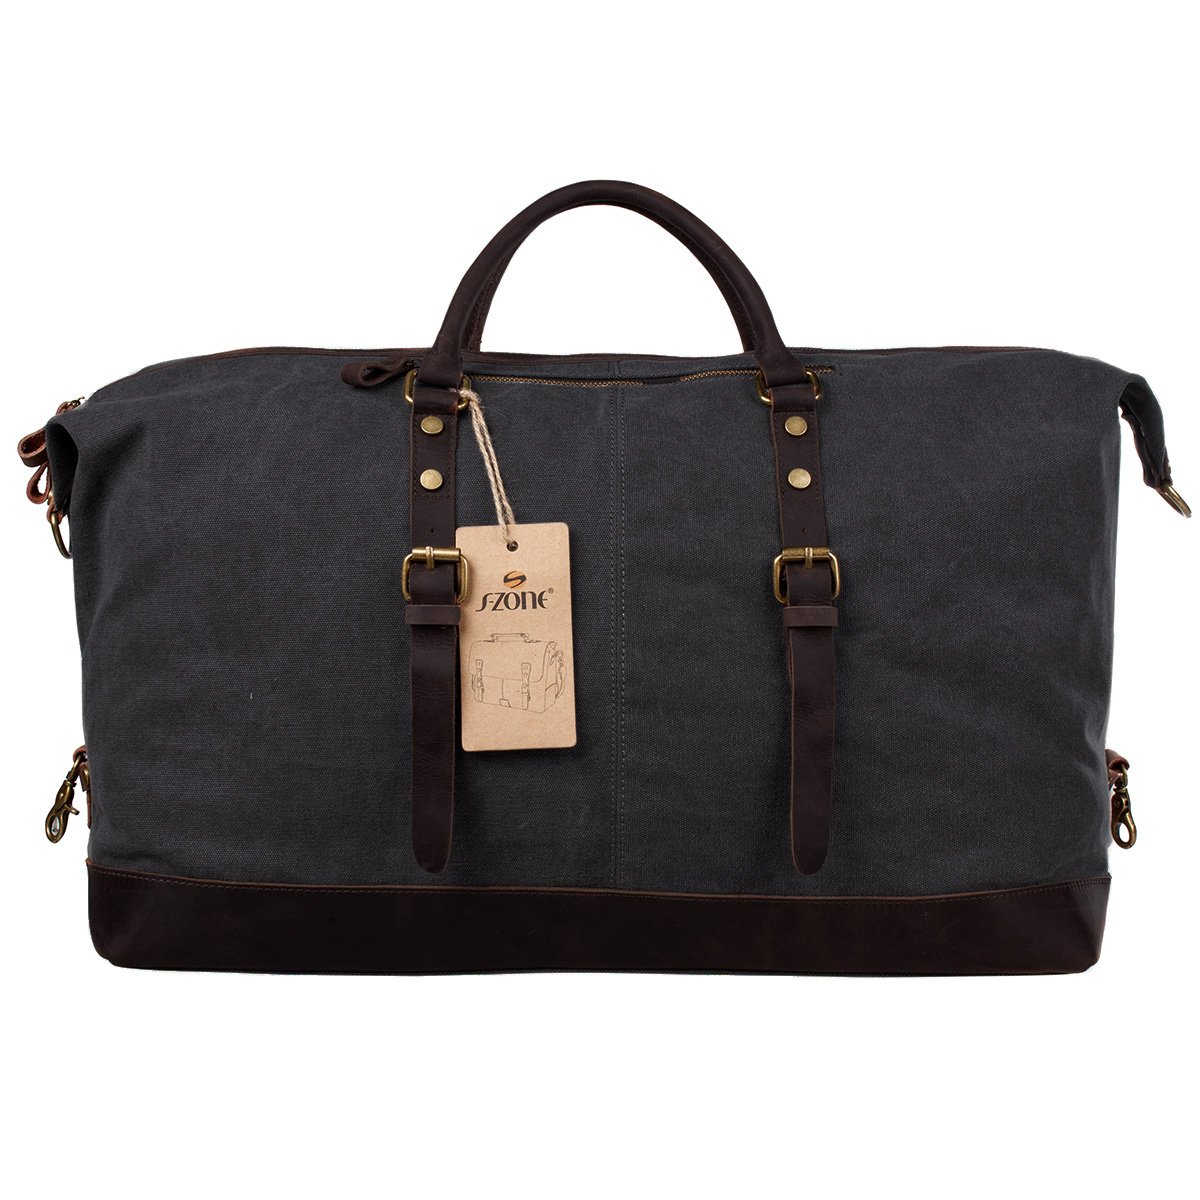 Amazon.com   S-ZONE Oversized Canvas Genuine Leather Trim Travel Tote Duffel  Shoulder Handbag Weekend Bag   Sports Duffels cfa5de2951